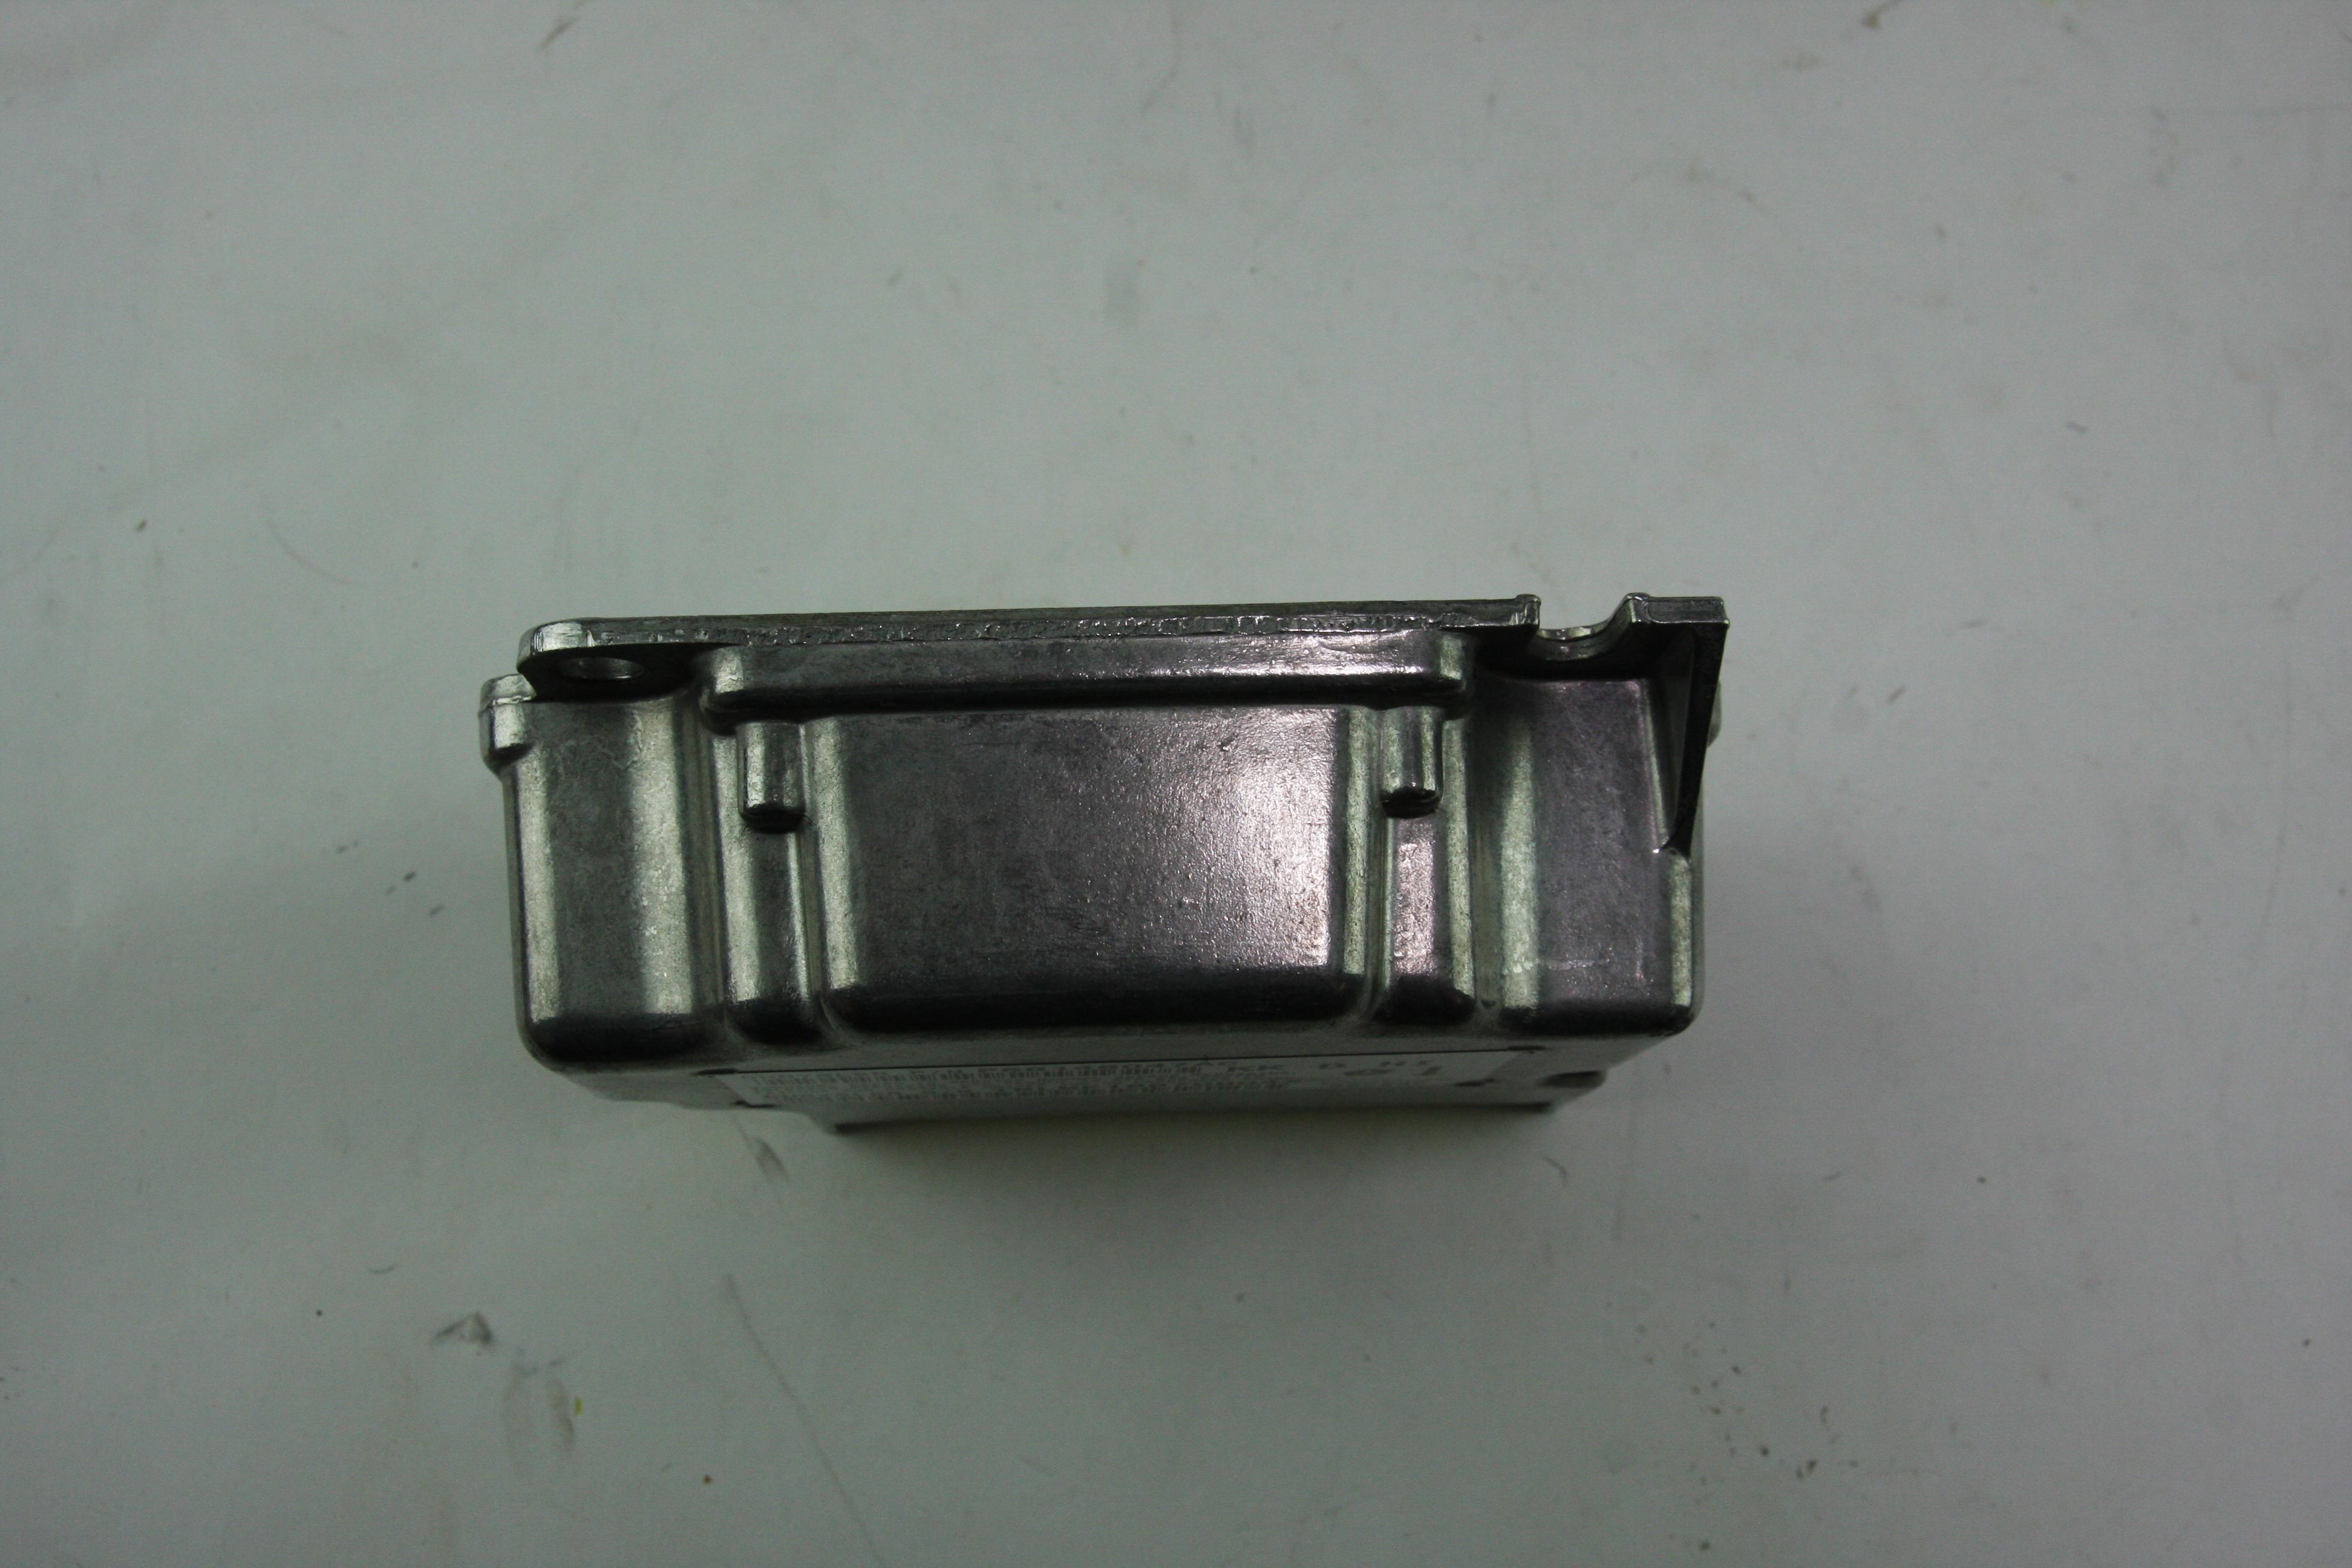 *** New OEM 68148047AC Mopar 11-12 Jeep Liberty Occupant Restraint Module - image 5